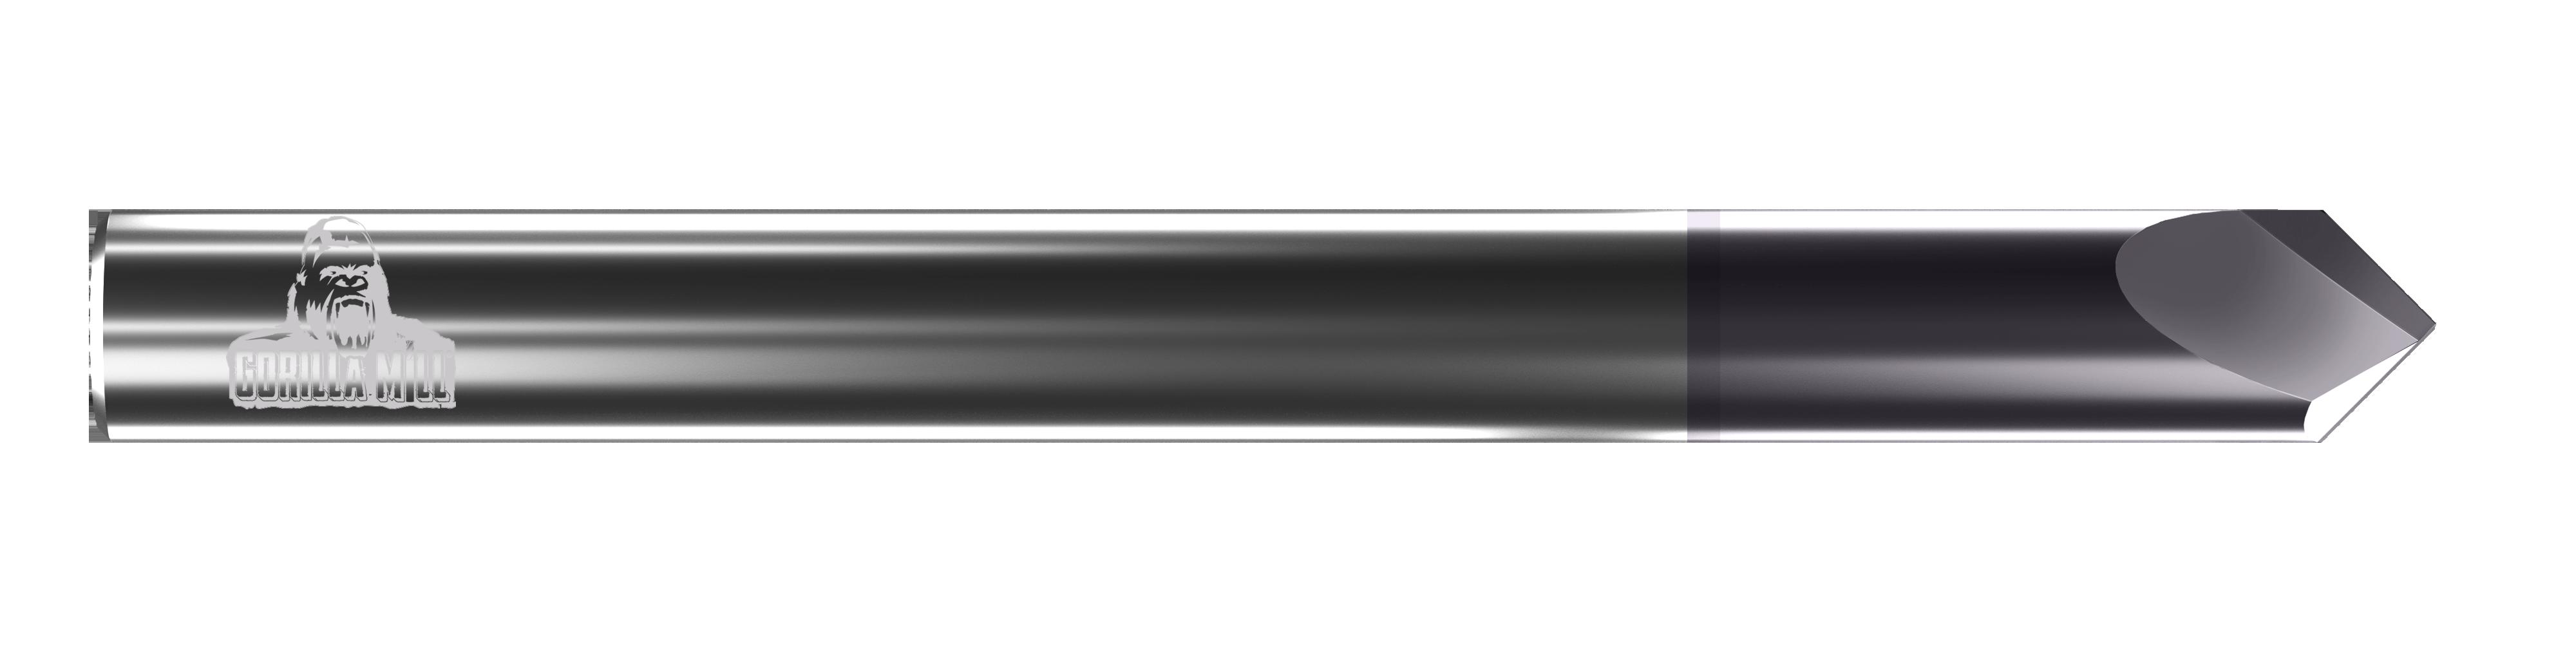 "1/8"" Diameter (2FLI)"